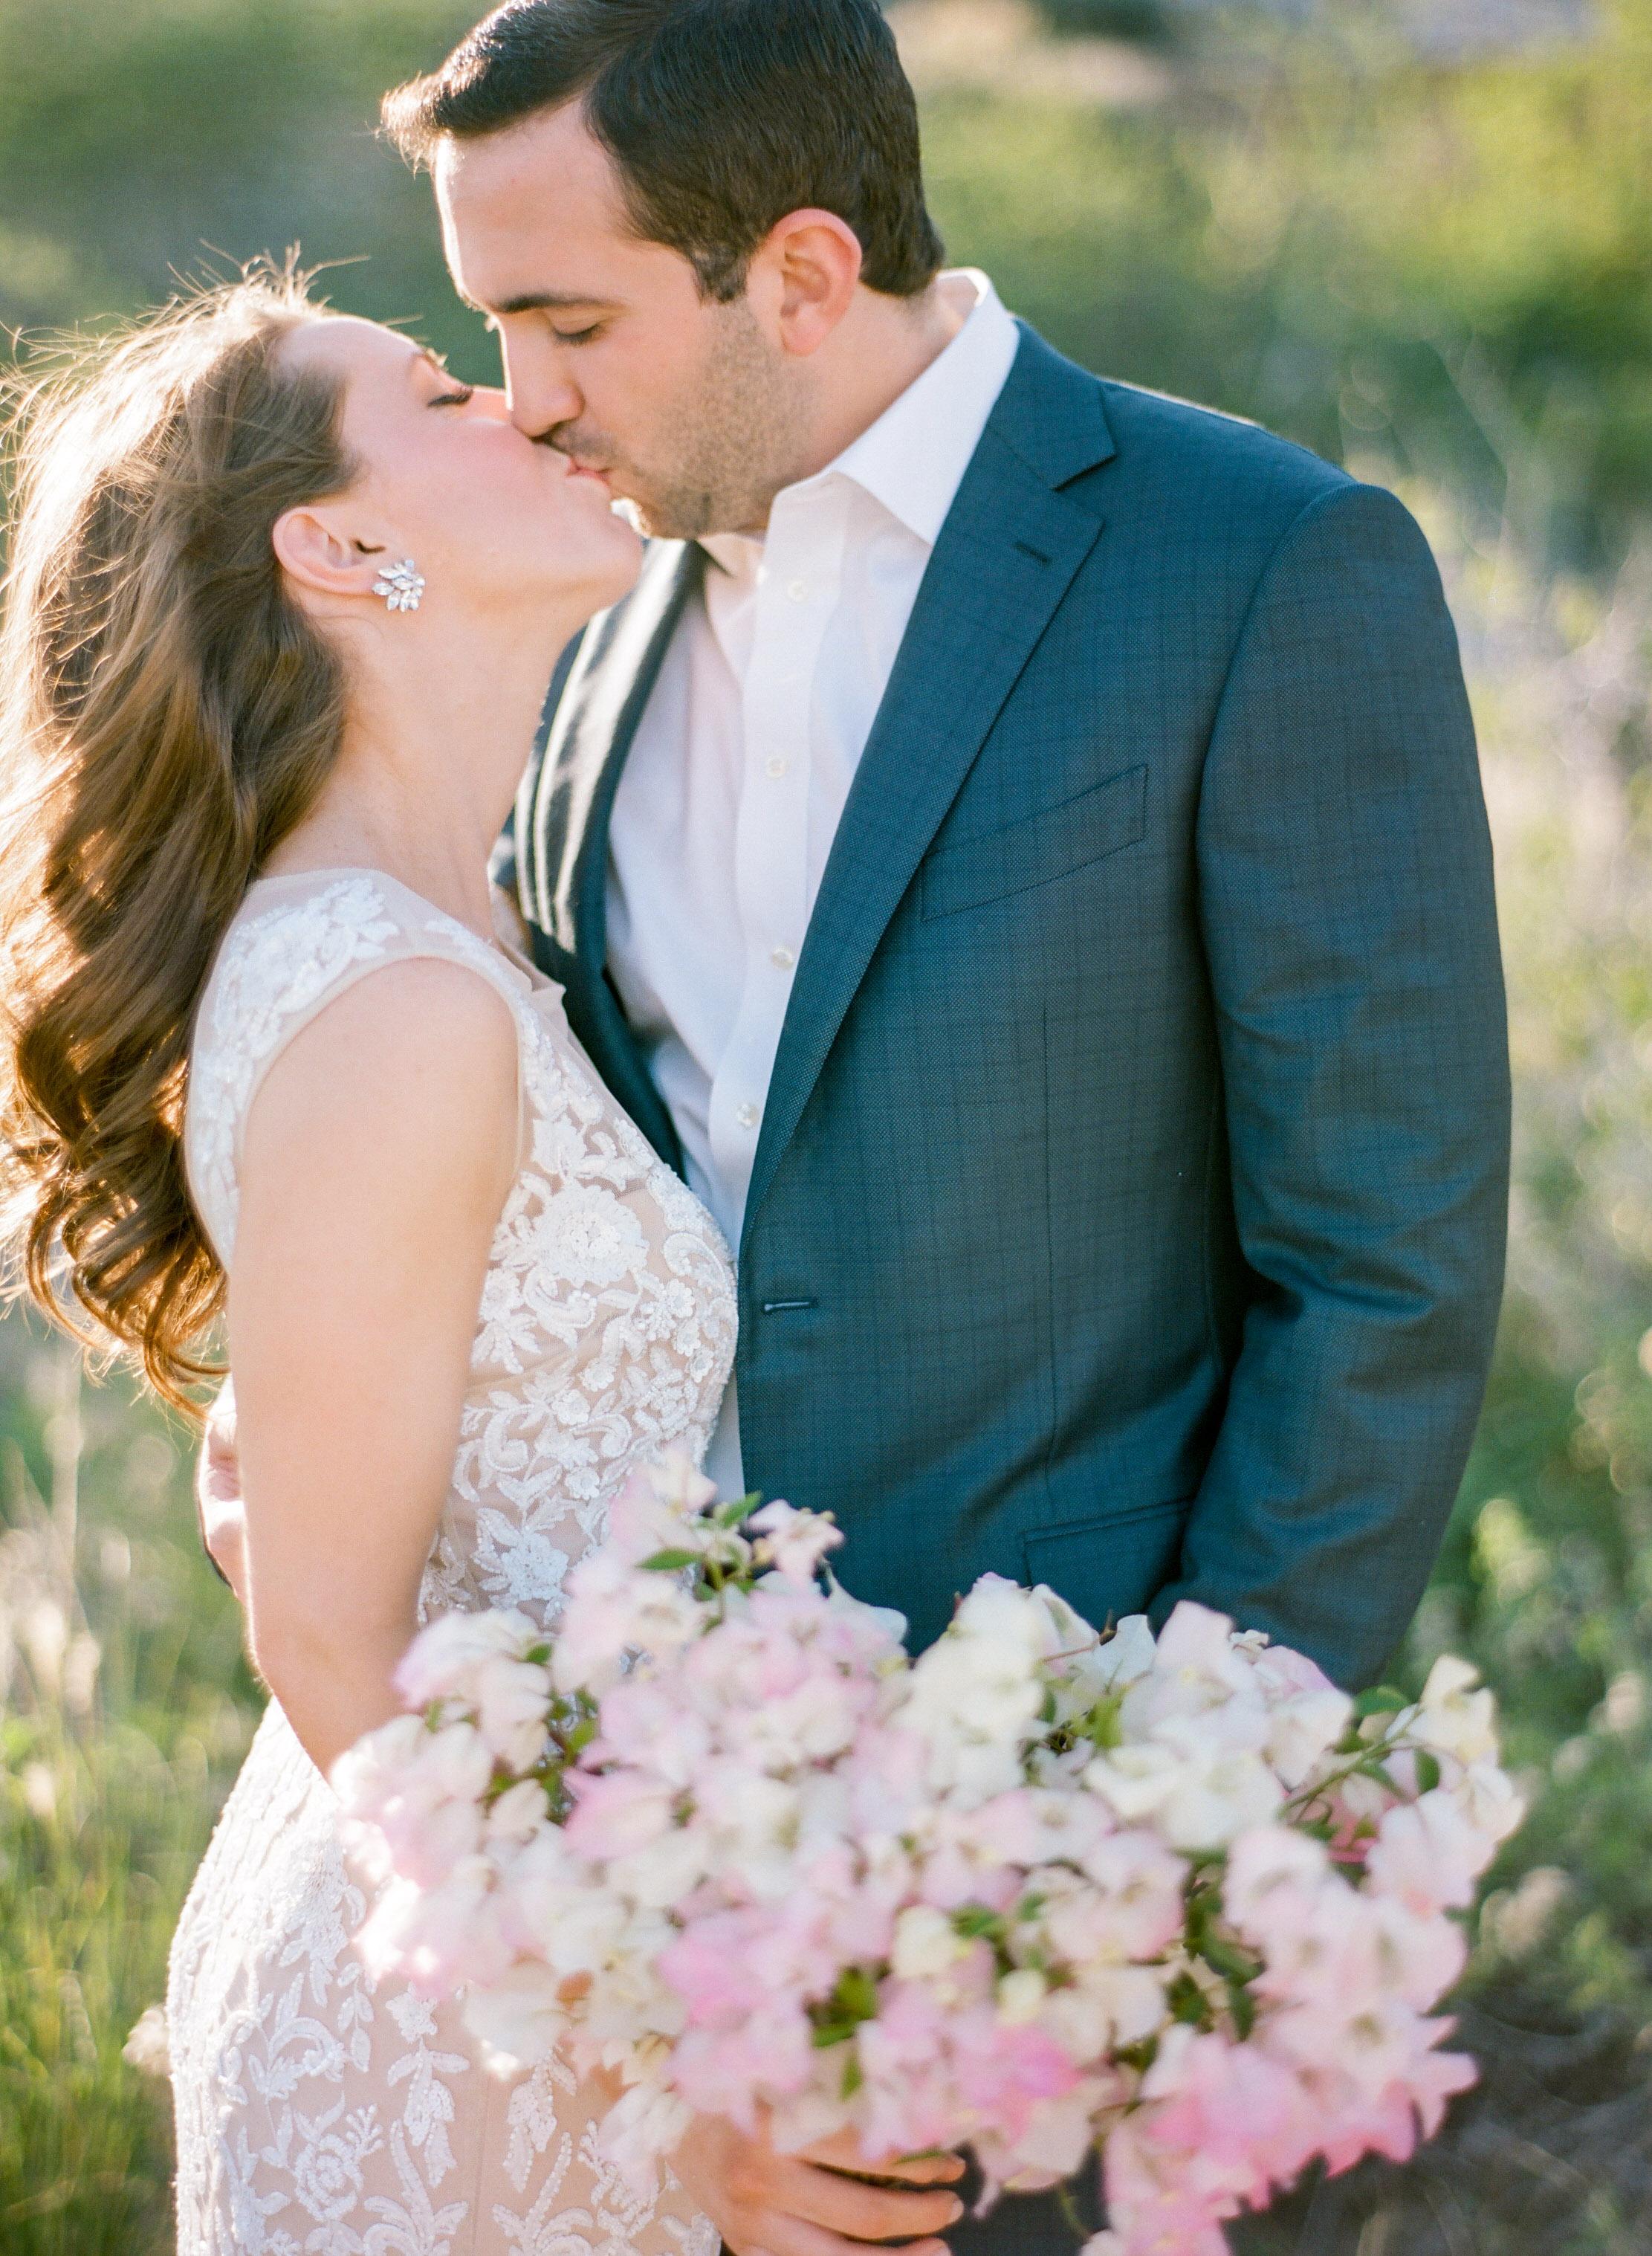 Dana-Fernandez-Photography-Destination-Wedding-Photographer-Cabo-San-Lucas-Film-Houston-Texas-Cabo-6.jpg